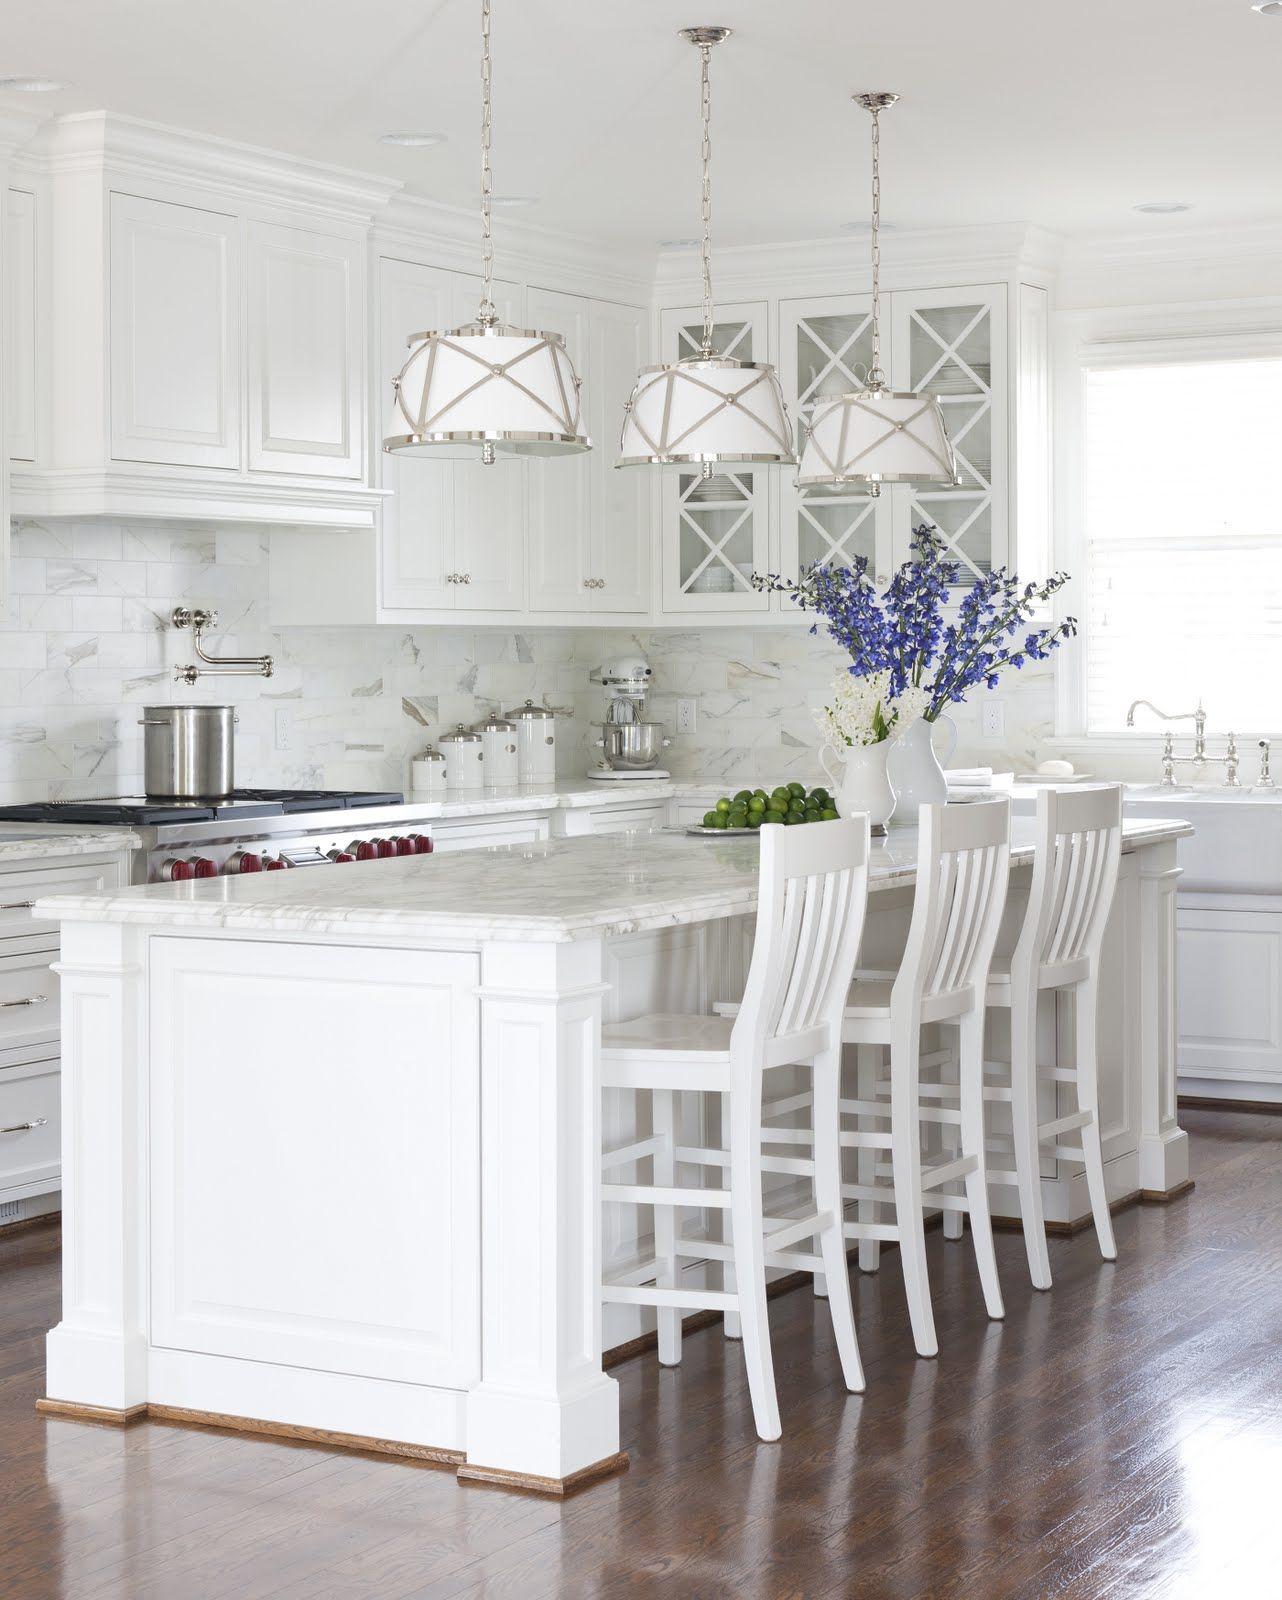 Marble counter, marble tile backsplash, lighting fixtures.  Glass cabinet doors with criss-cross millwork.